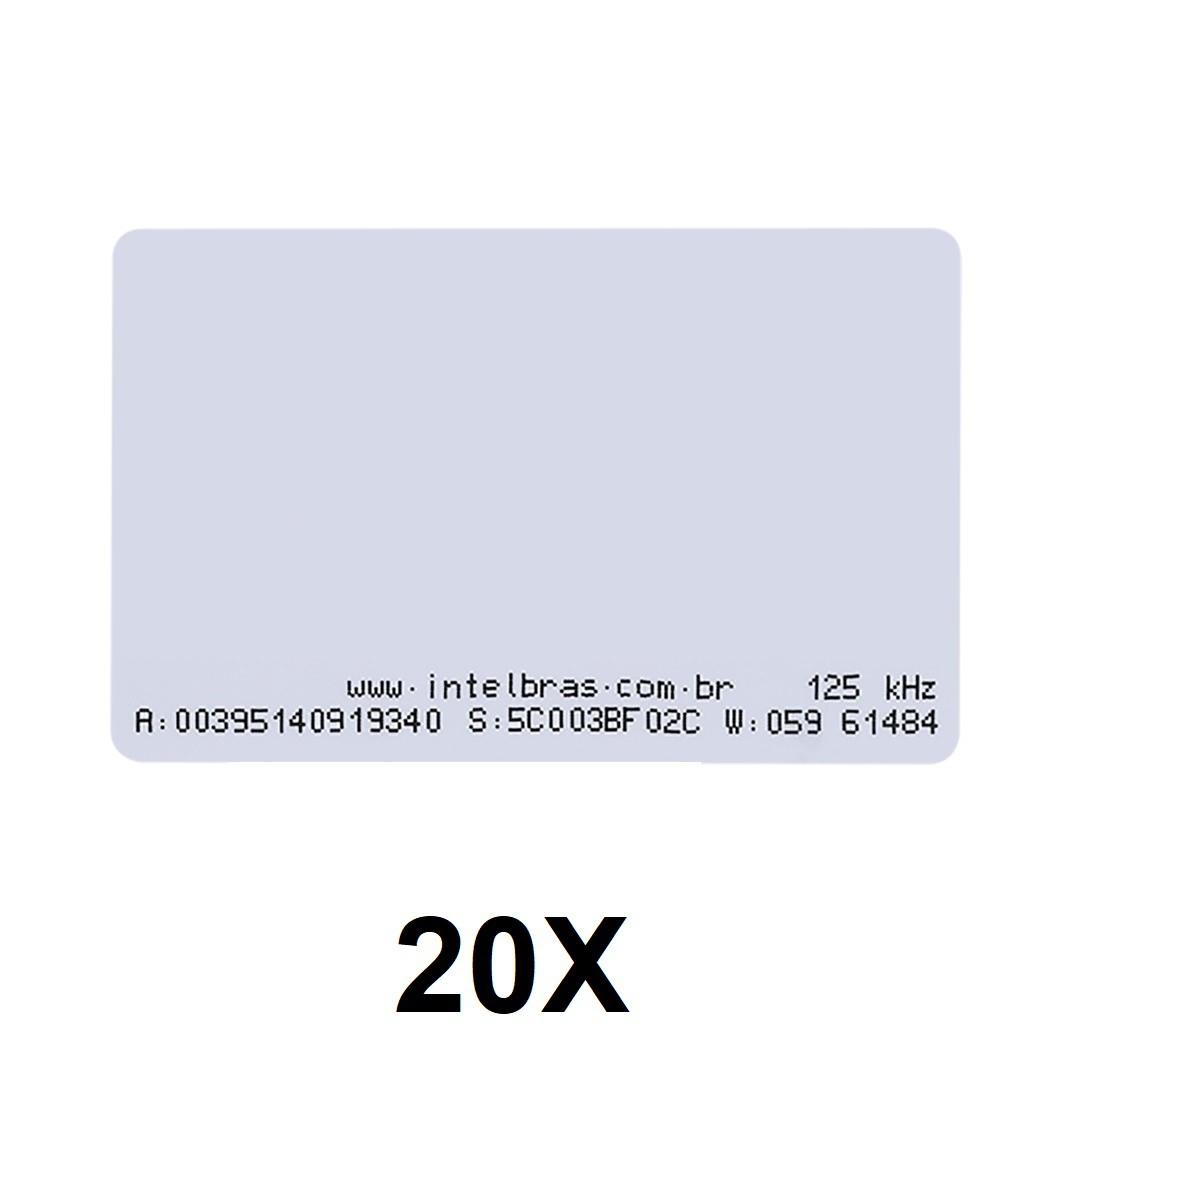 Kit 20 Cartões de Proximidade RFID 125 kHz Intelbras TH 2000